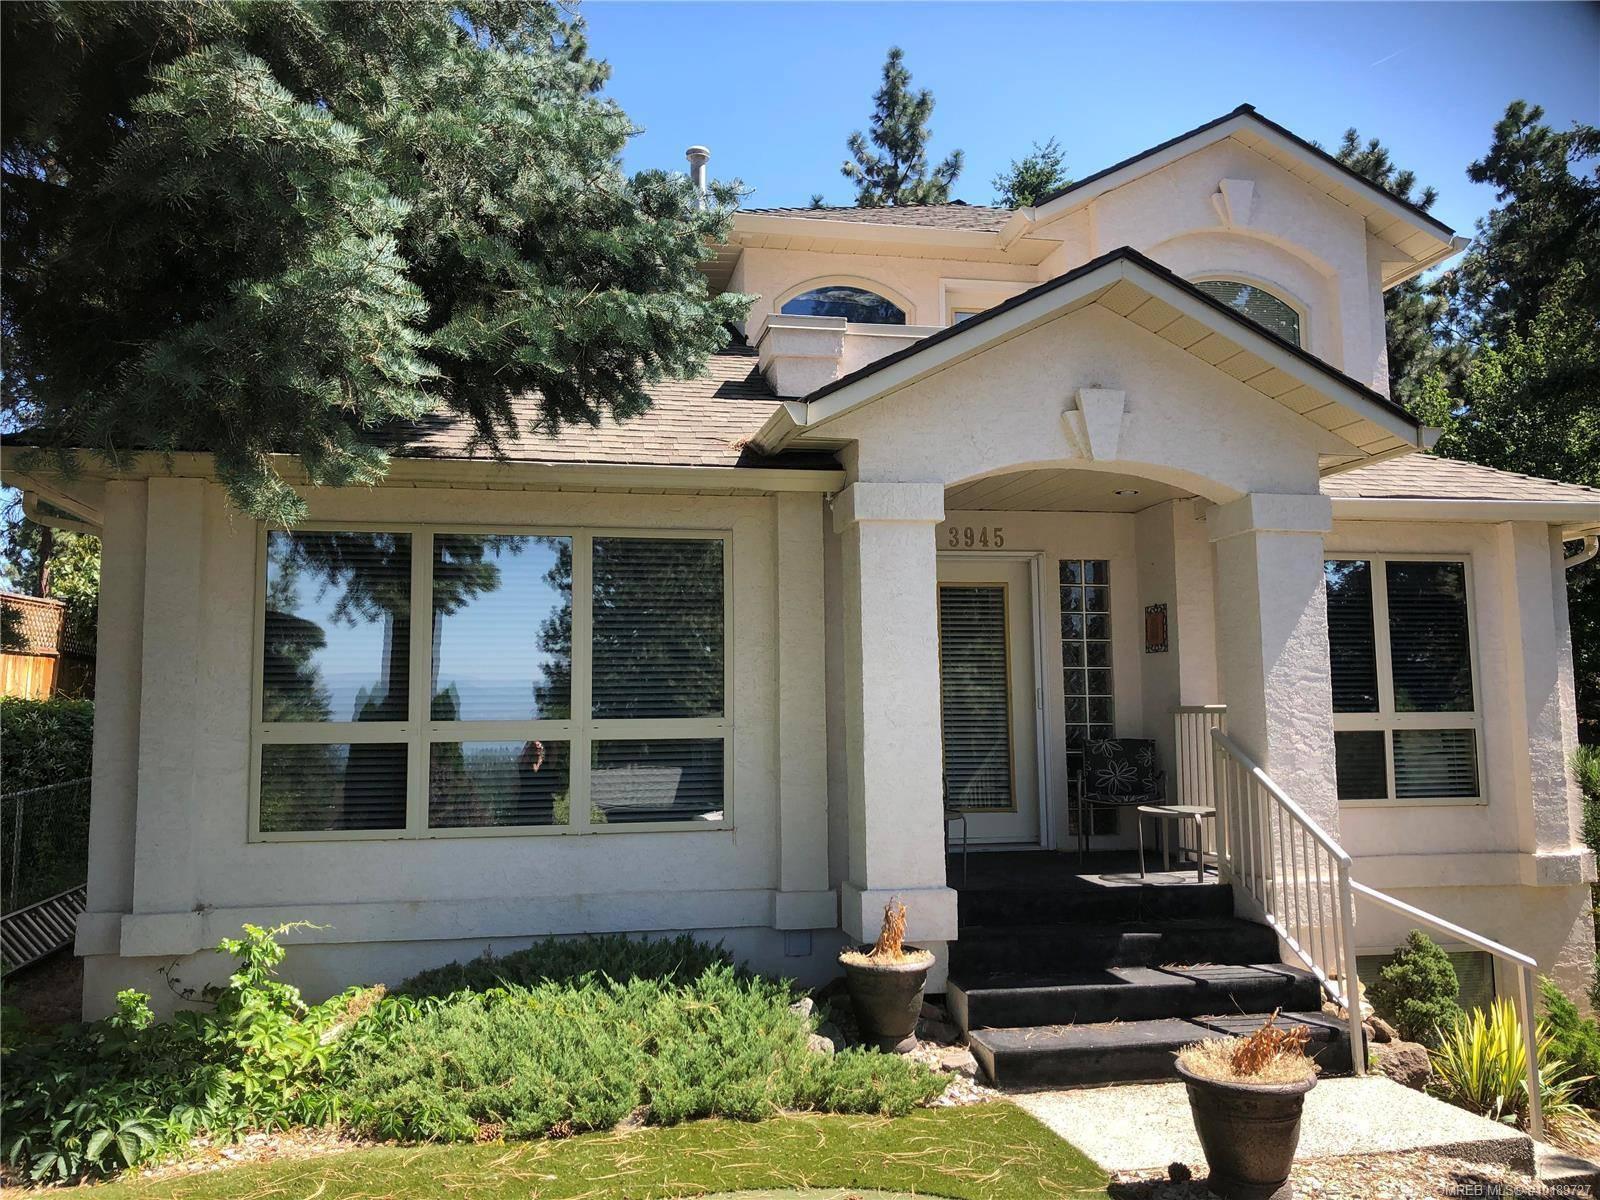 House for sale at 3945 Suncrest Ct Kelowna British Columbia - MLS: 10189727